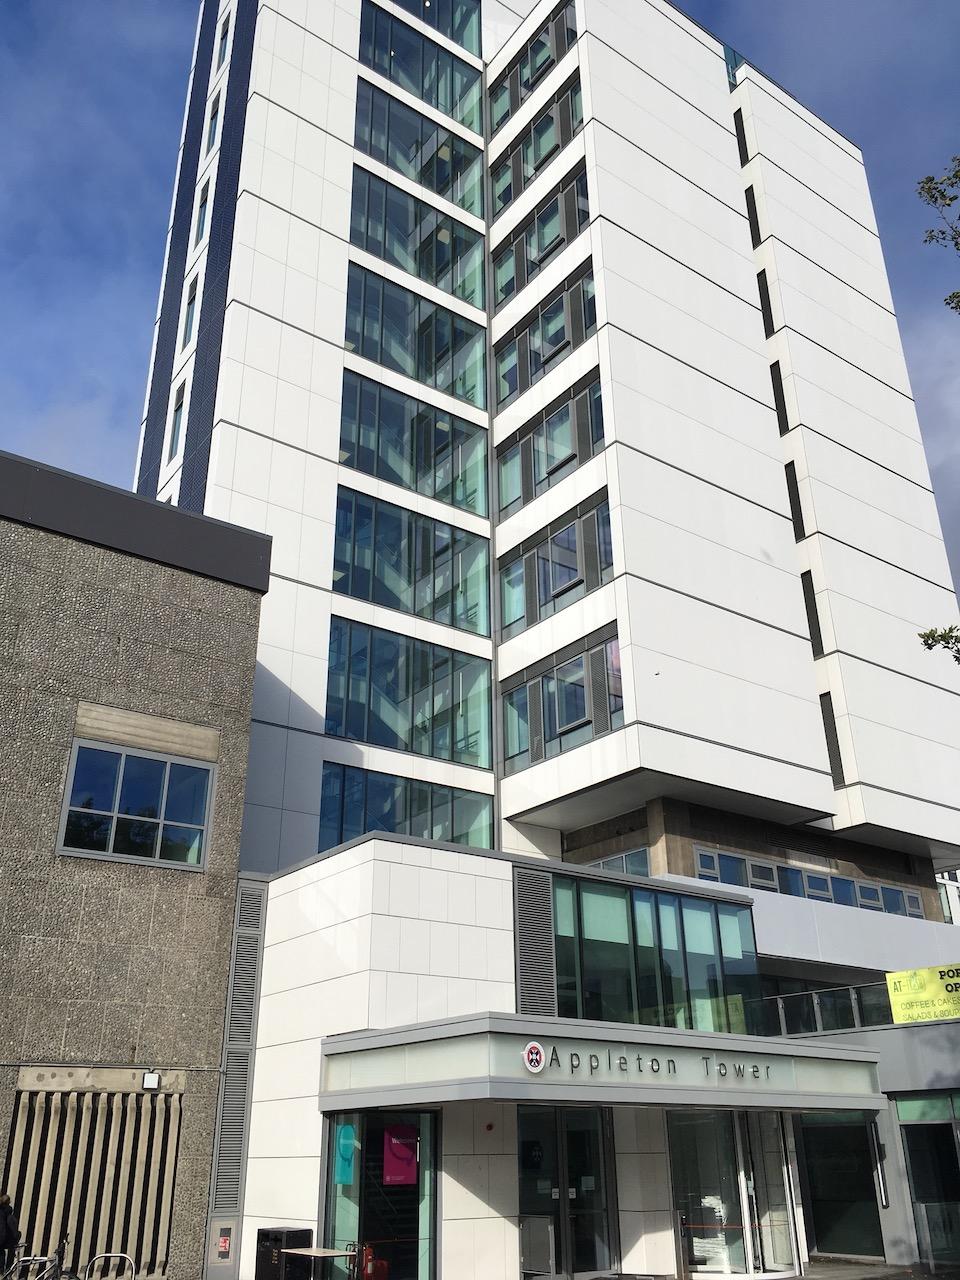 Informatics学院的教学楼Appleton tower,9层楼在爱宝已经很高了